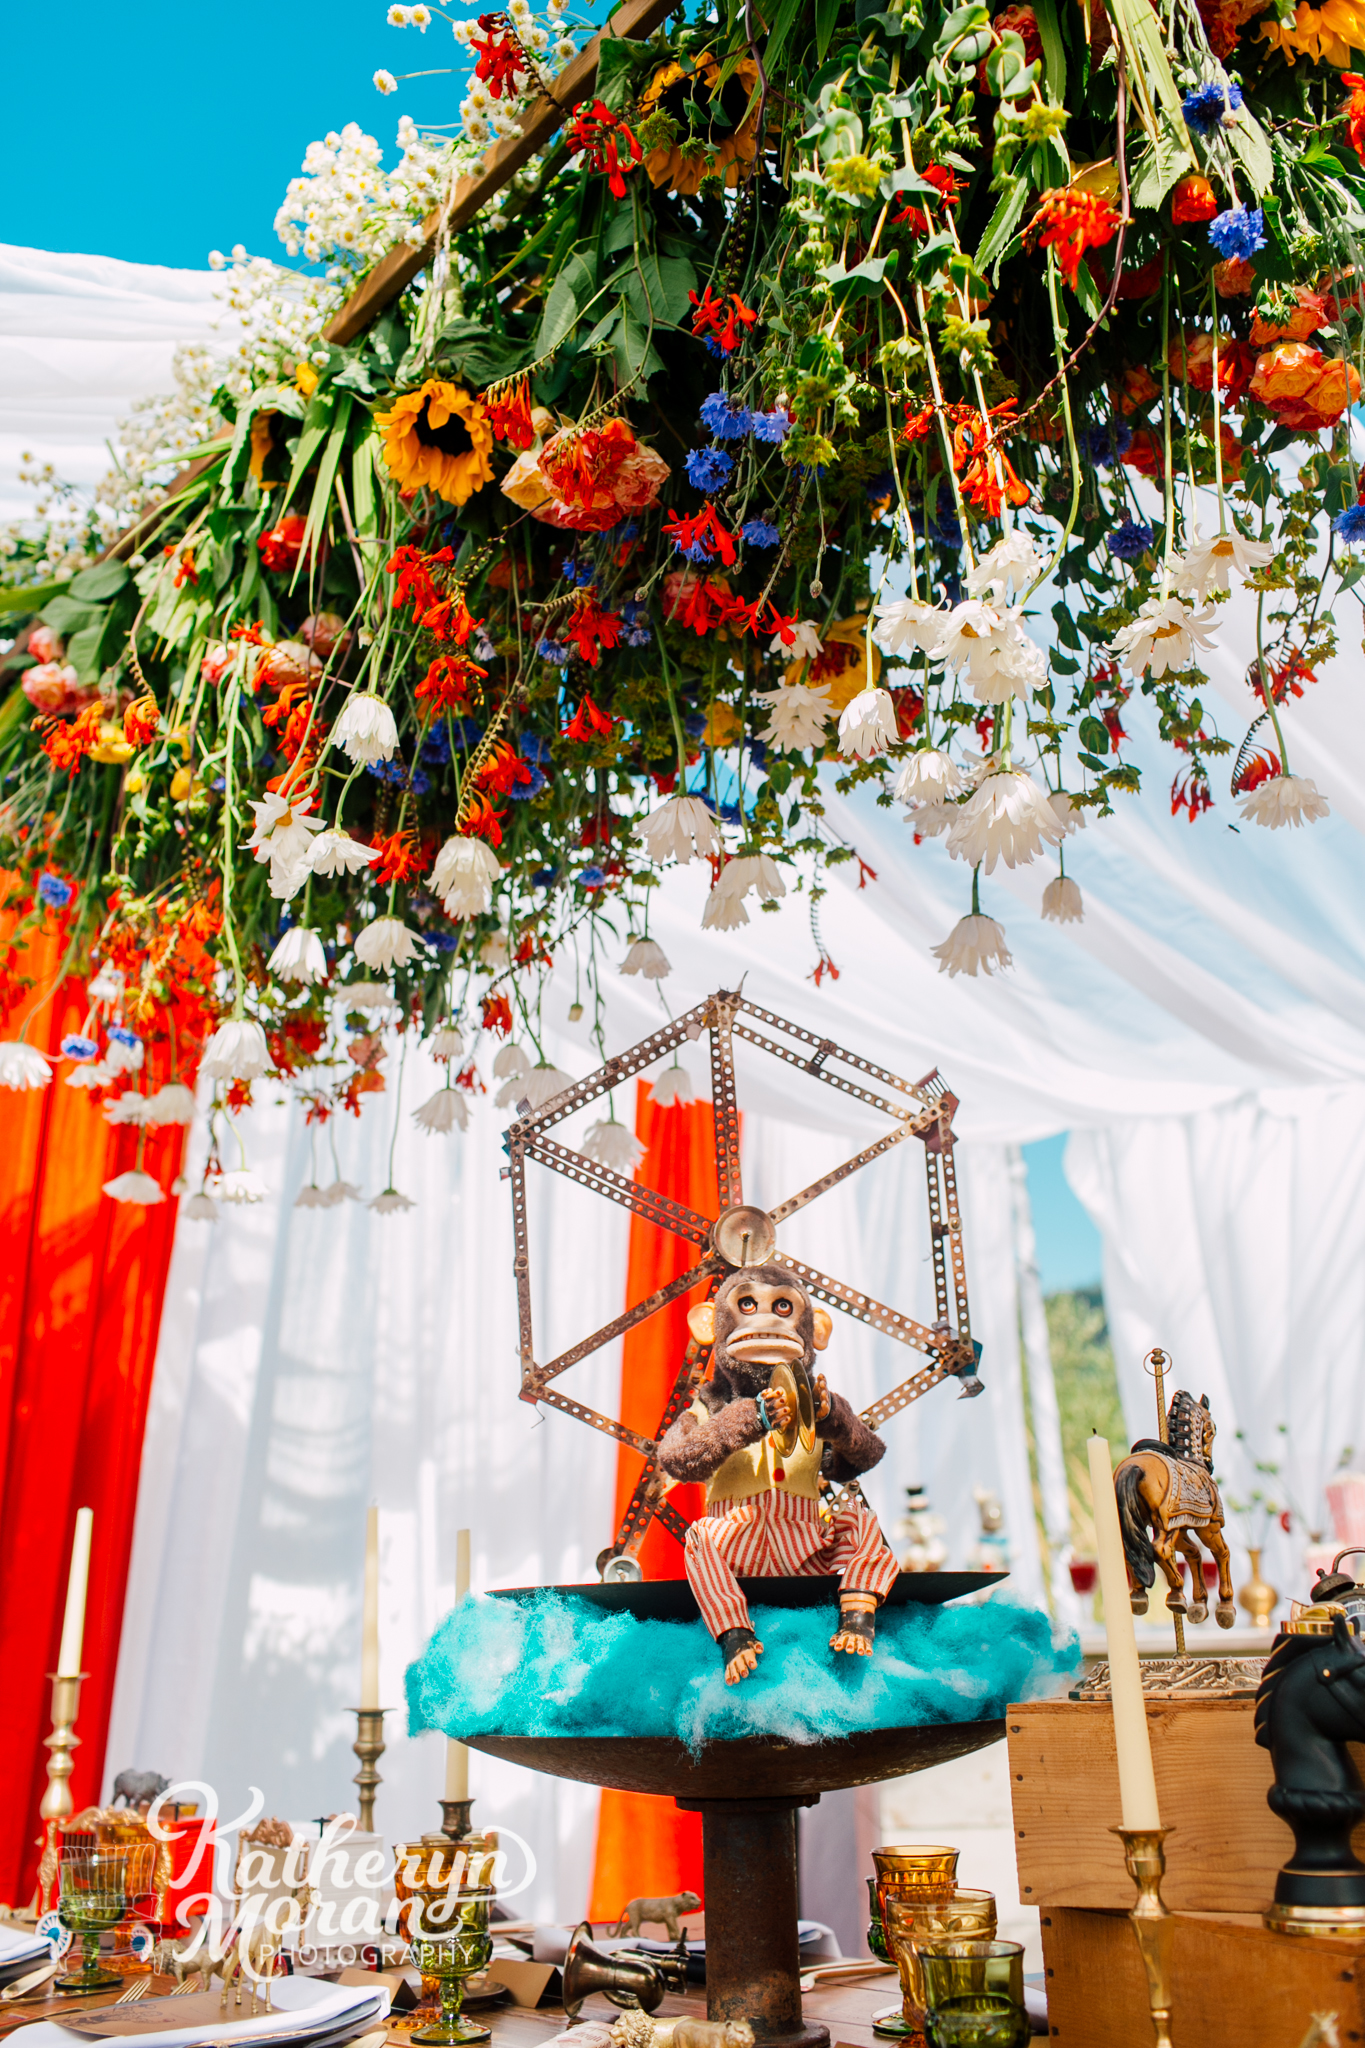 bellingham-seattle-event-photographer-vintage-circus-styled-katheryn-moran-34.jpg